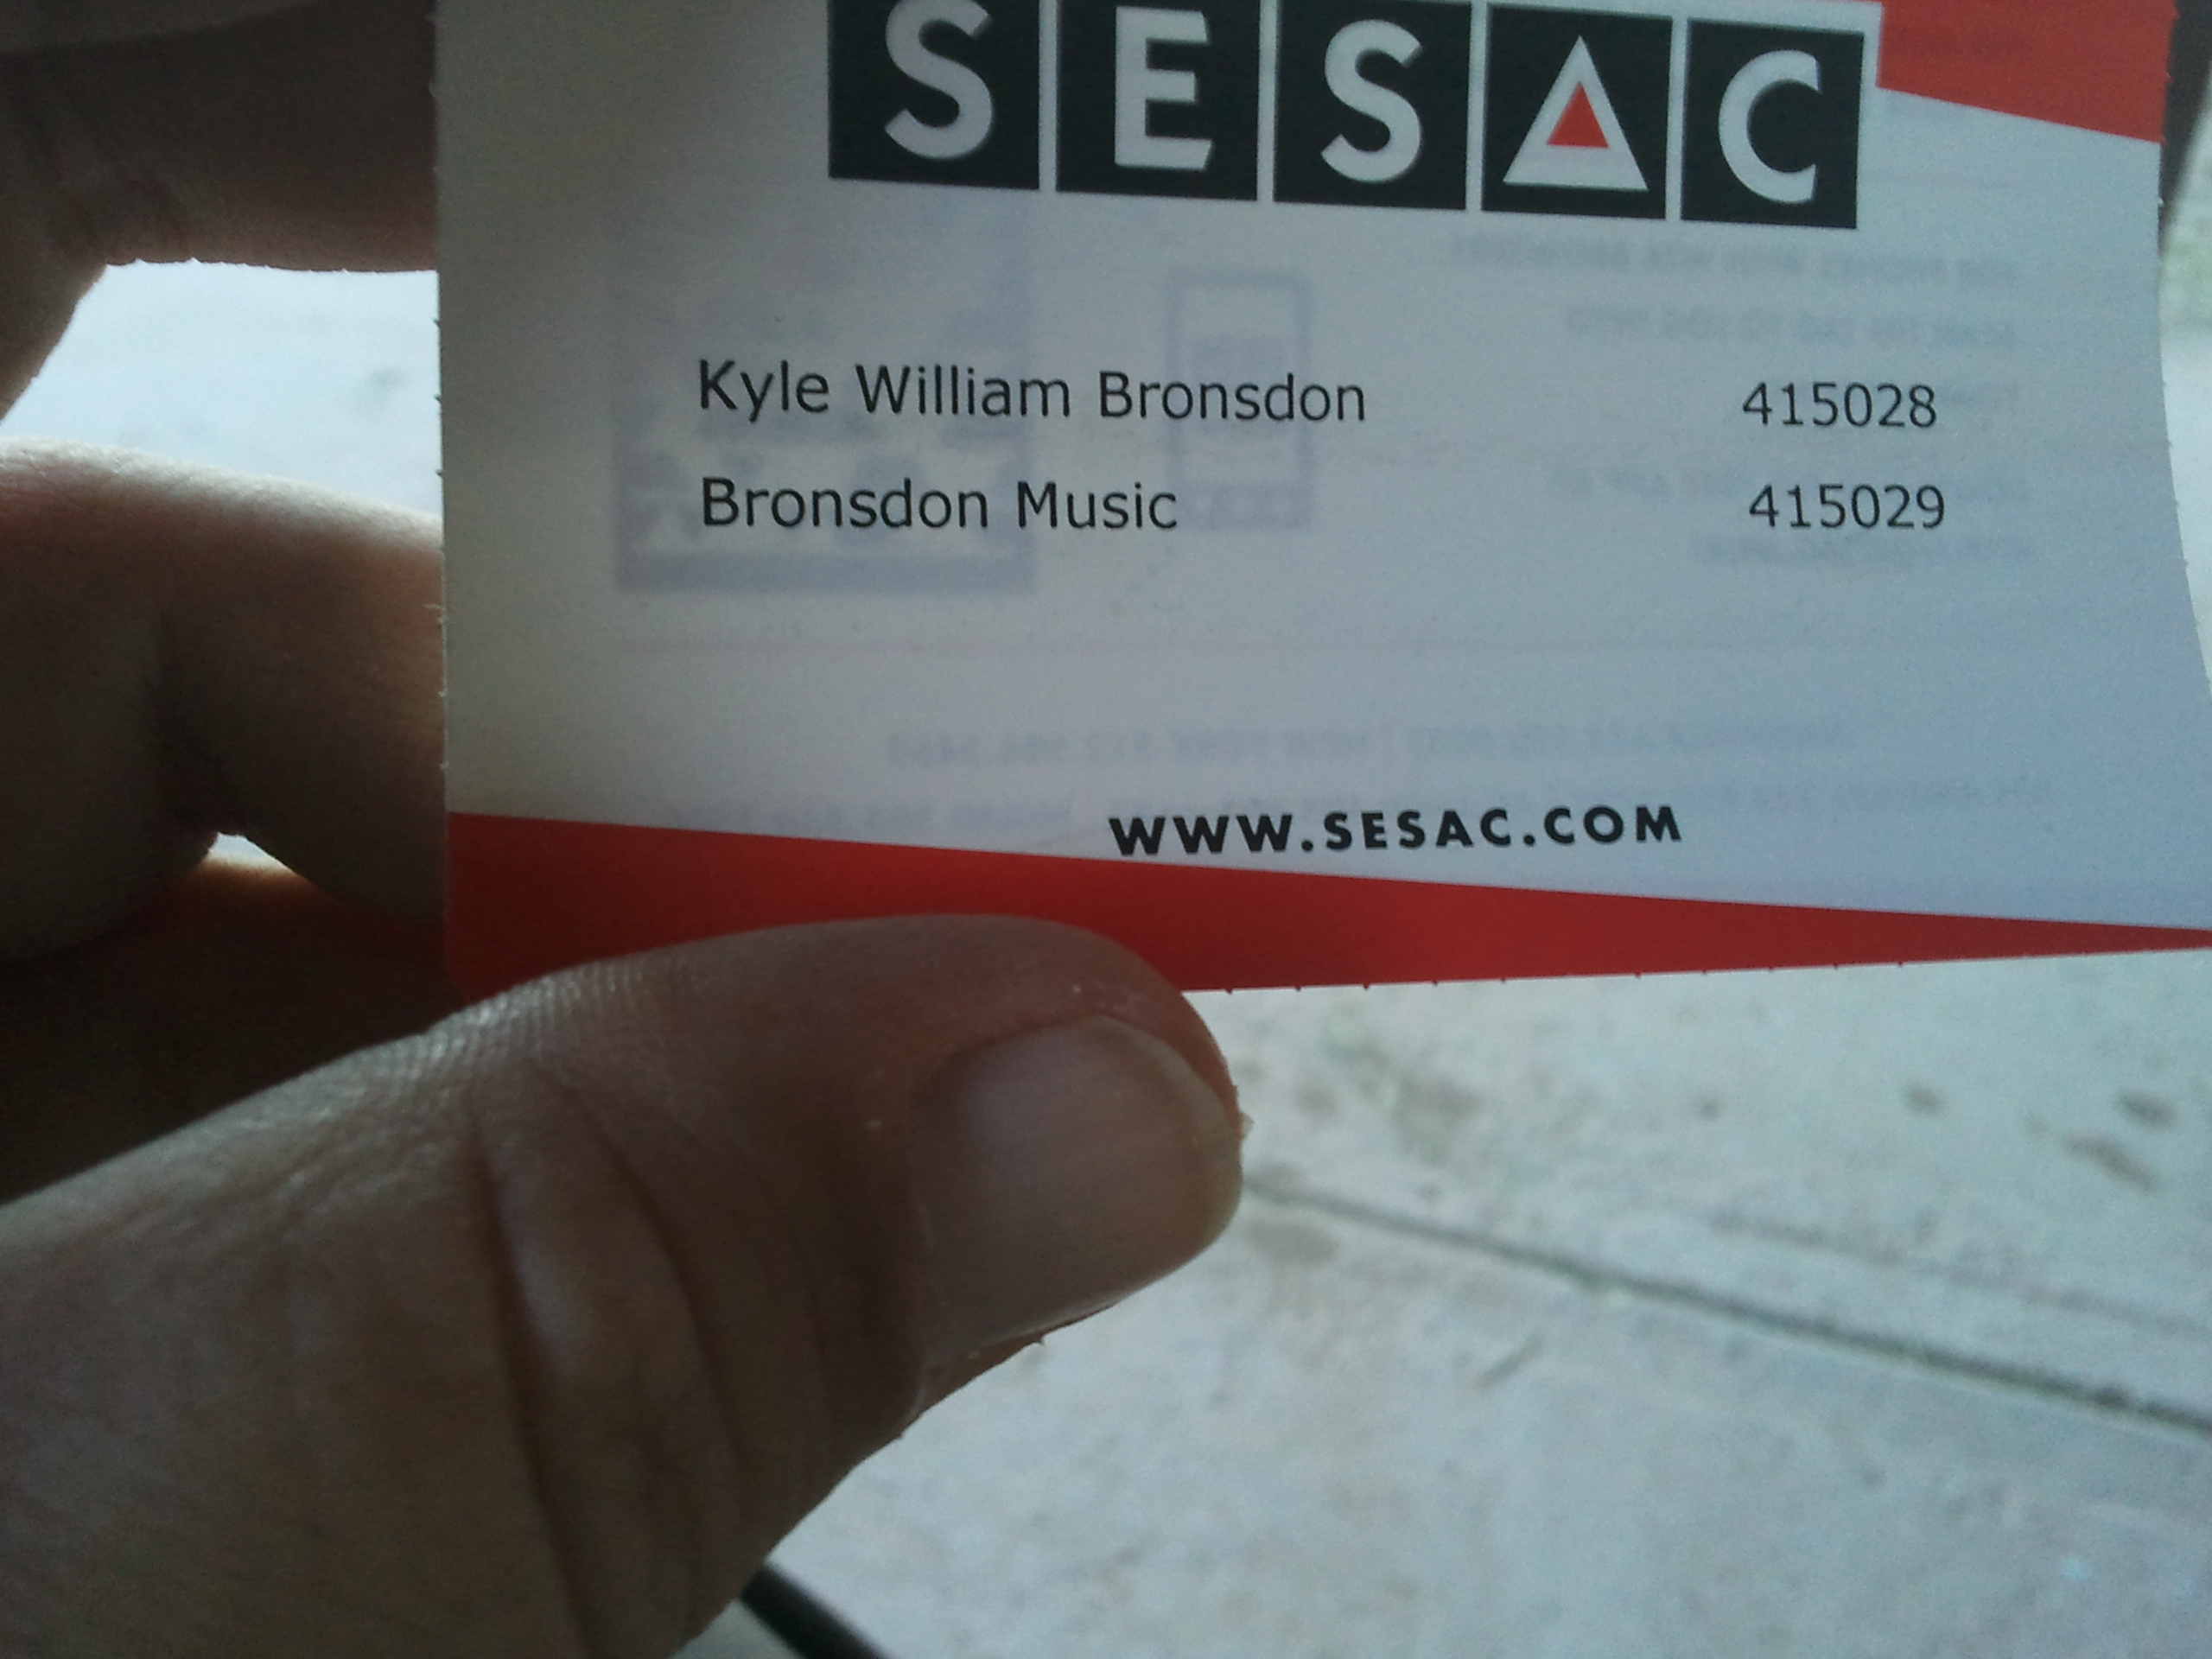 My SESAC card